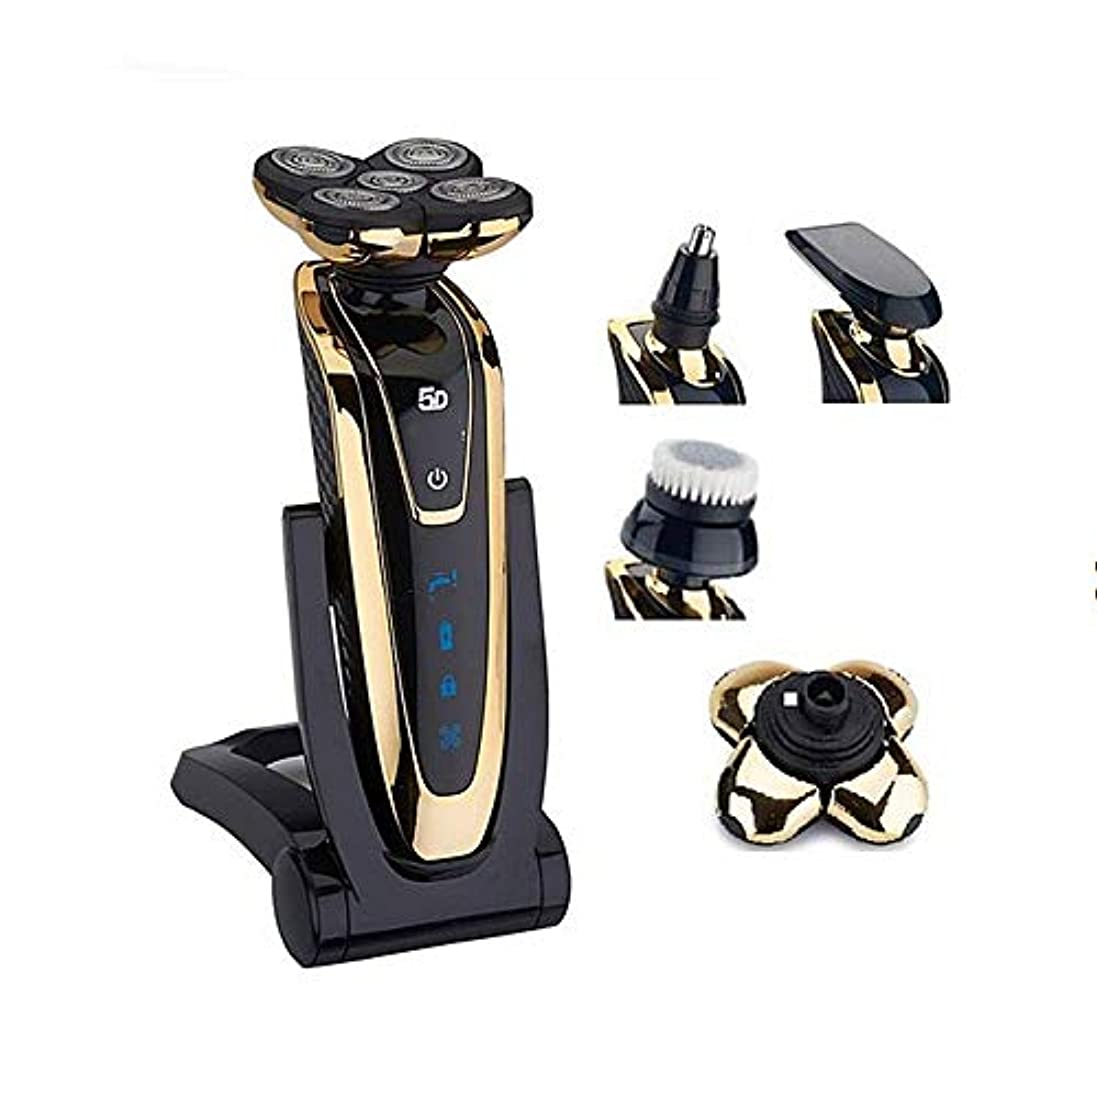 yangdi 男性用ウェット/ドライ5dシェーバー電動かみそり充電式ボディシェービングマシン防水ひげシェーバークリーニングゴールド